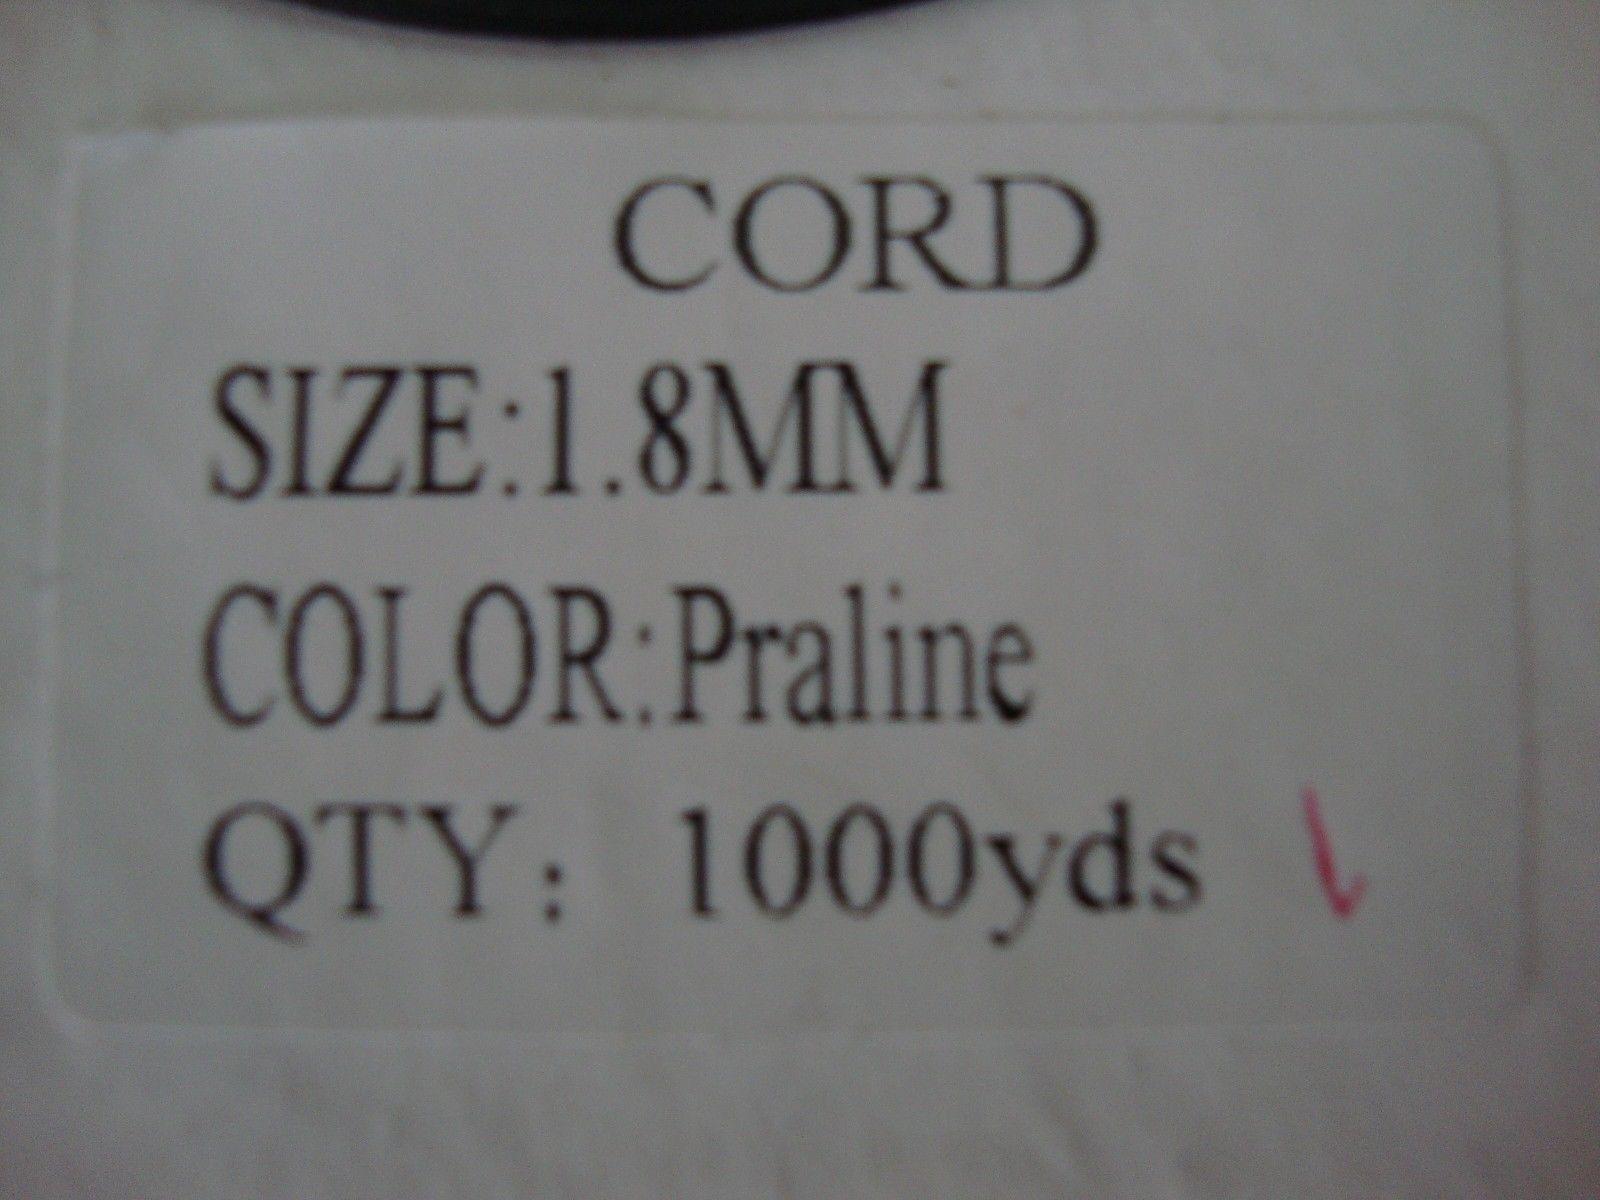 1000 YARDS :1.8mm LIFT CORD:, in  Praline